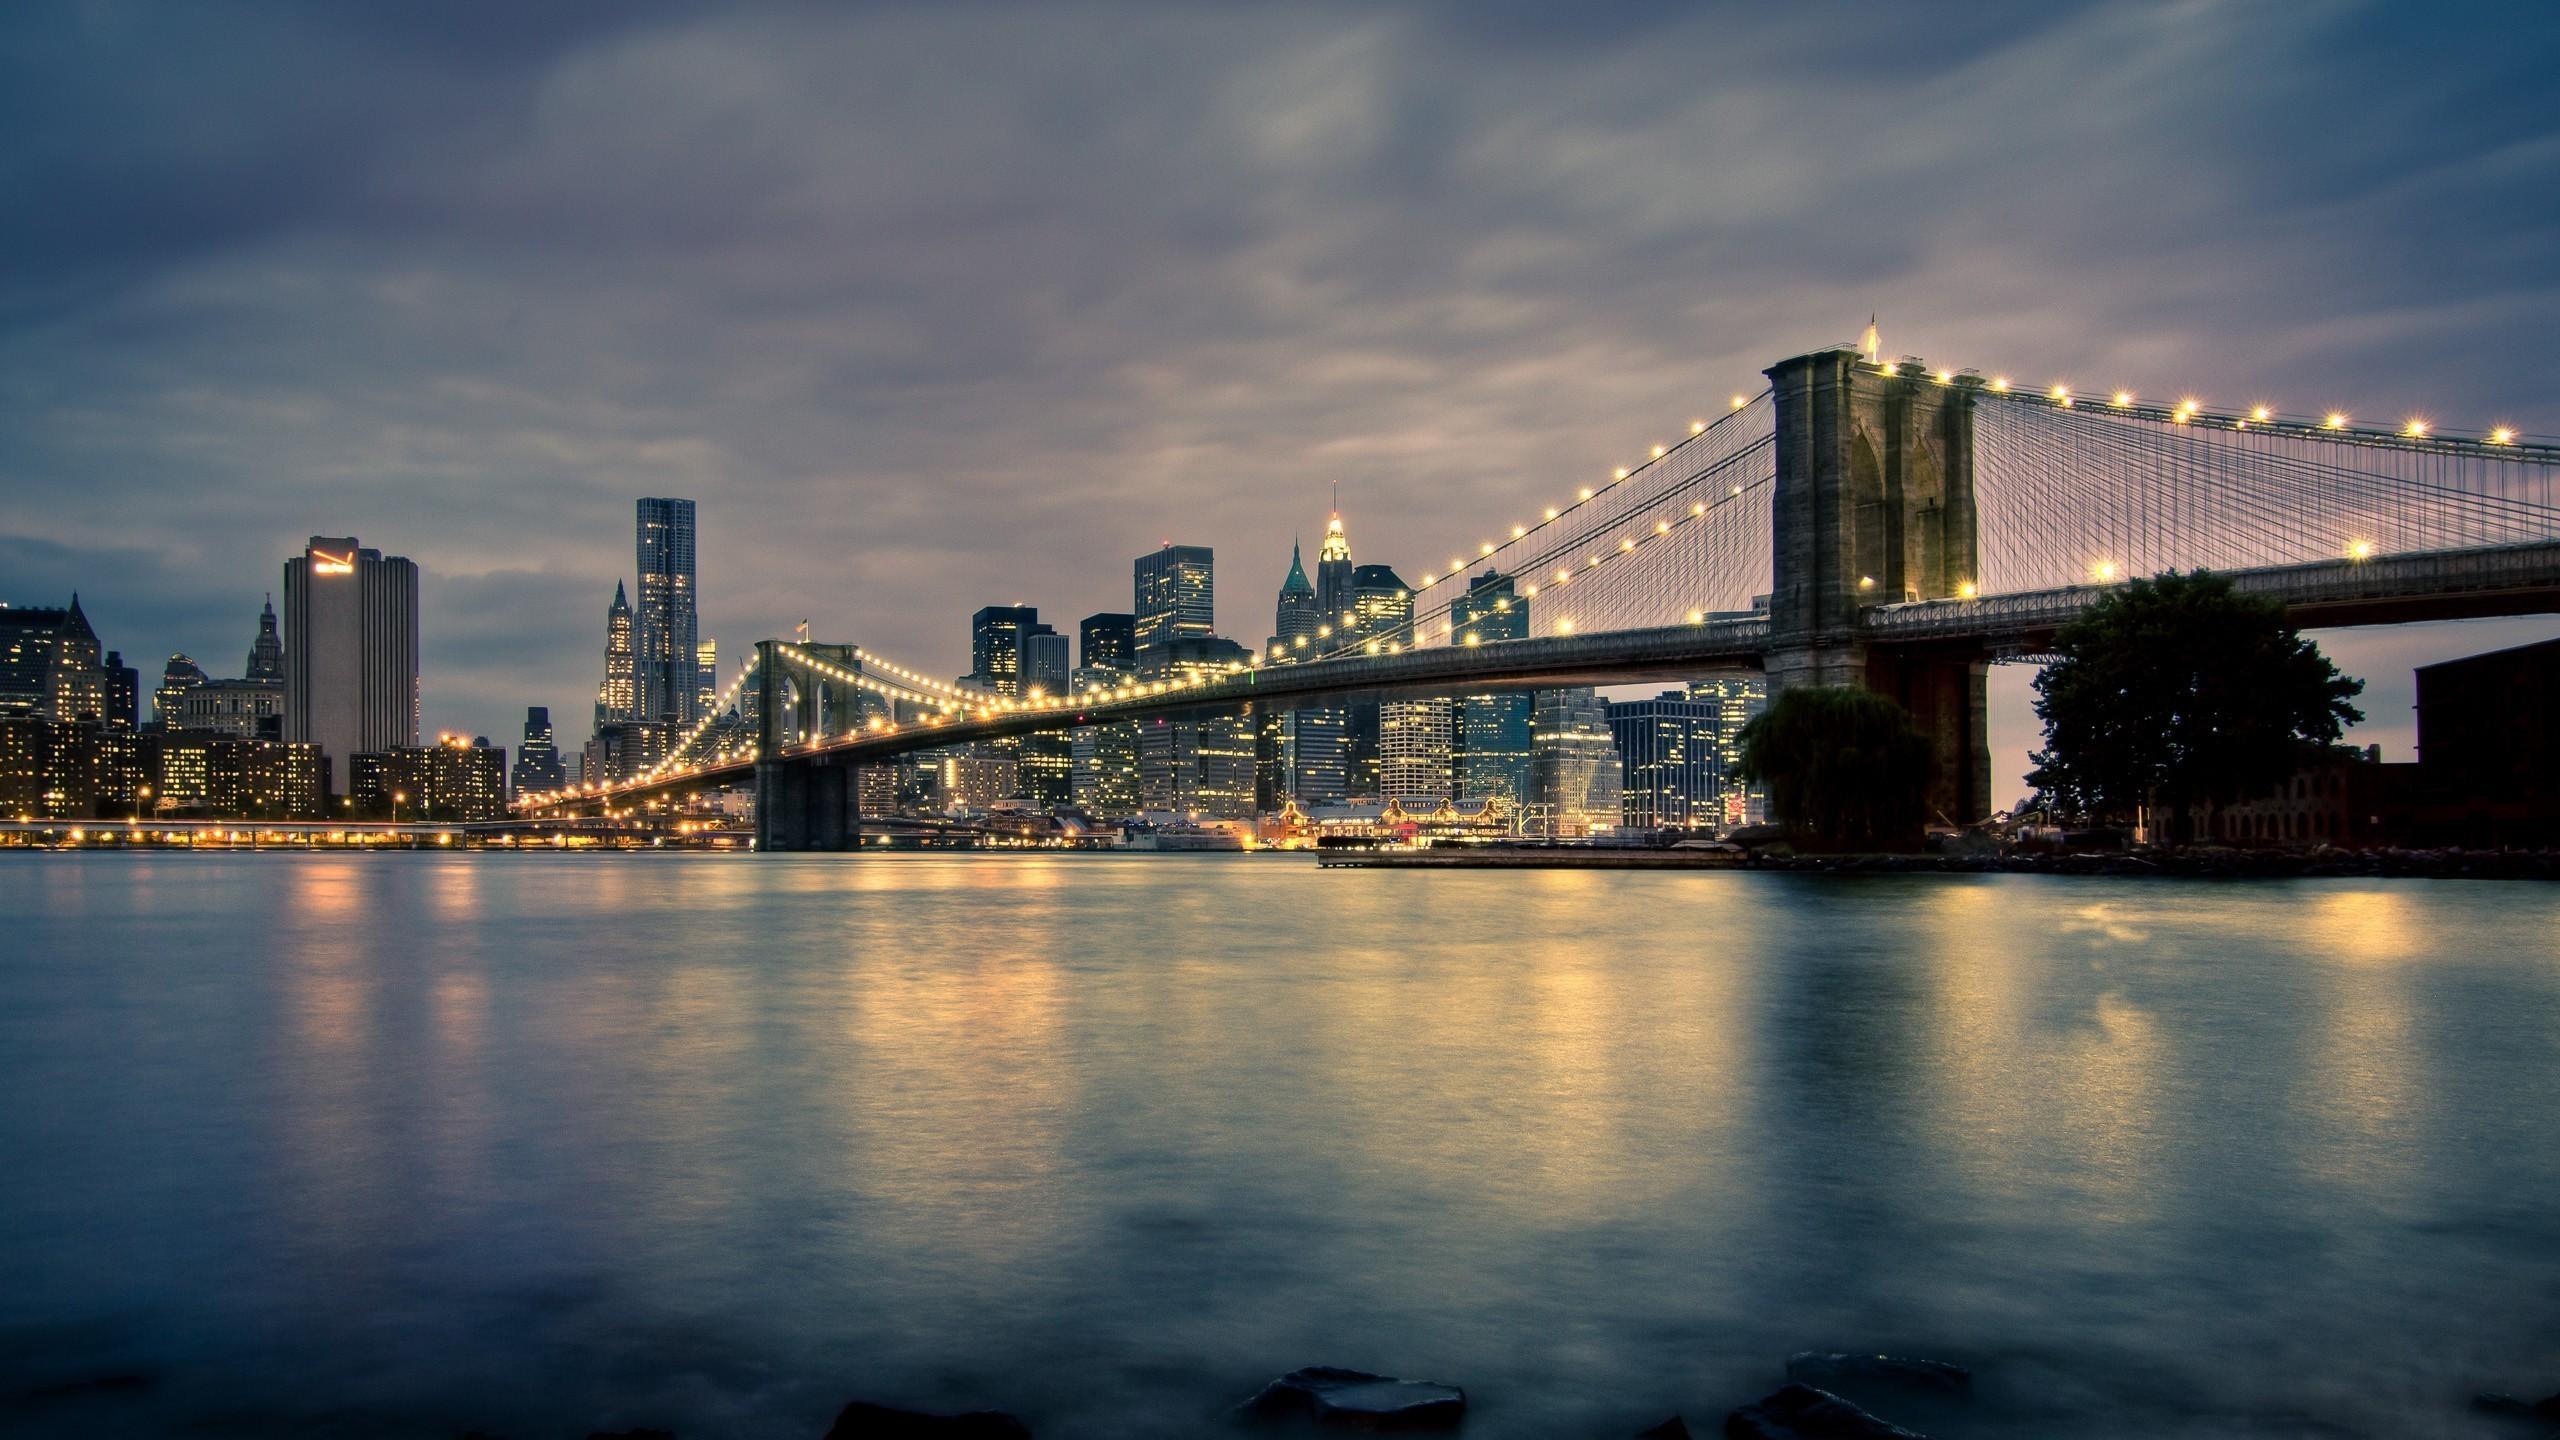 Brooklyn Bridge Wallpaper 76 Images